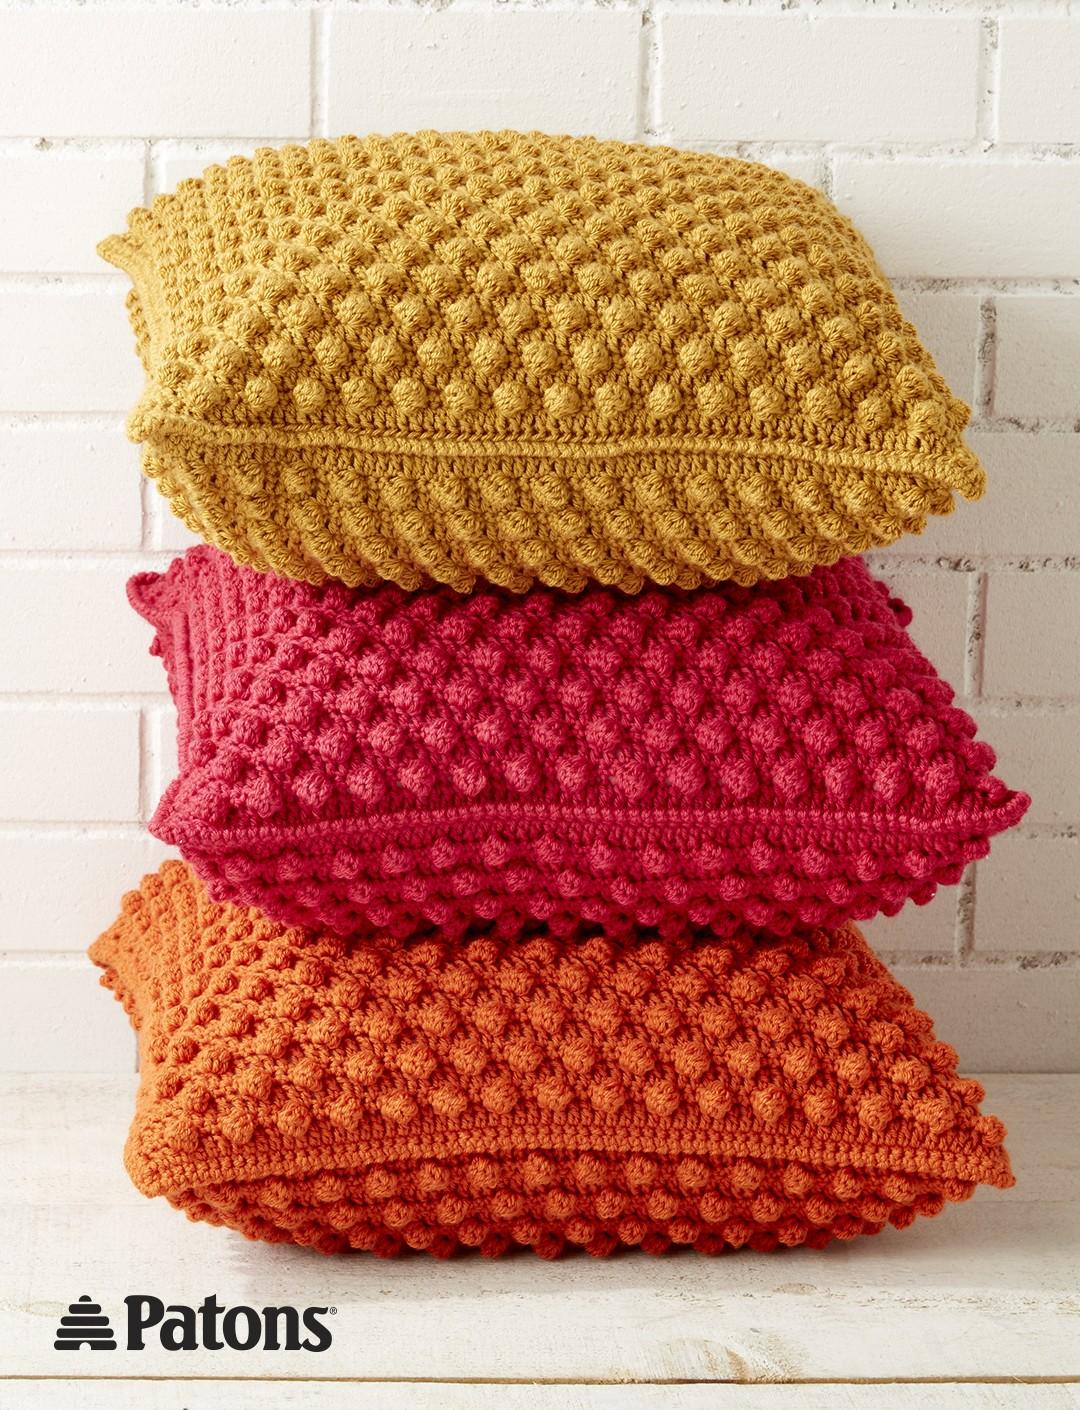 crochet pillow bobble-licious pillows mebnpqa